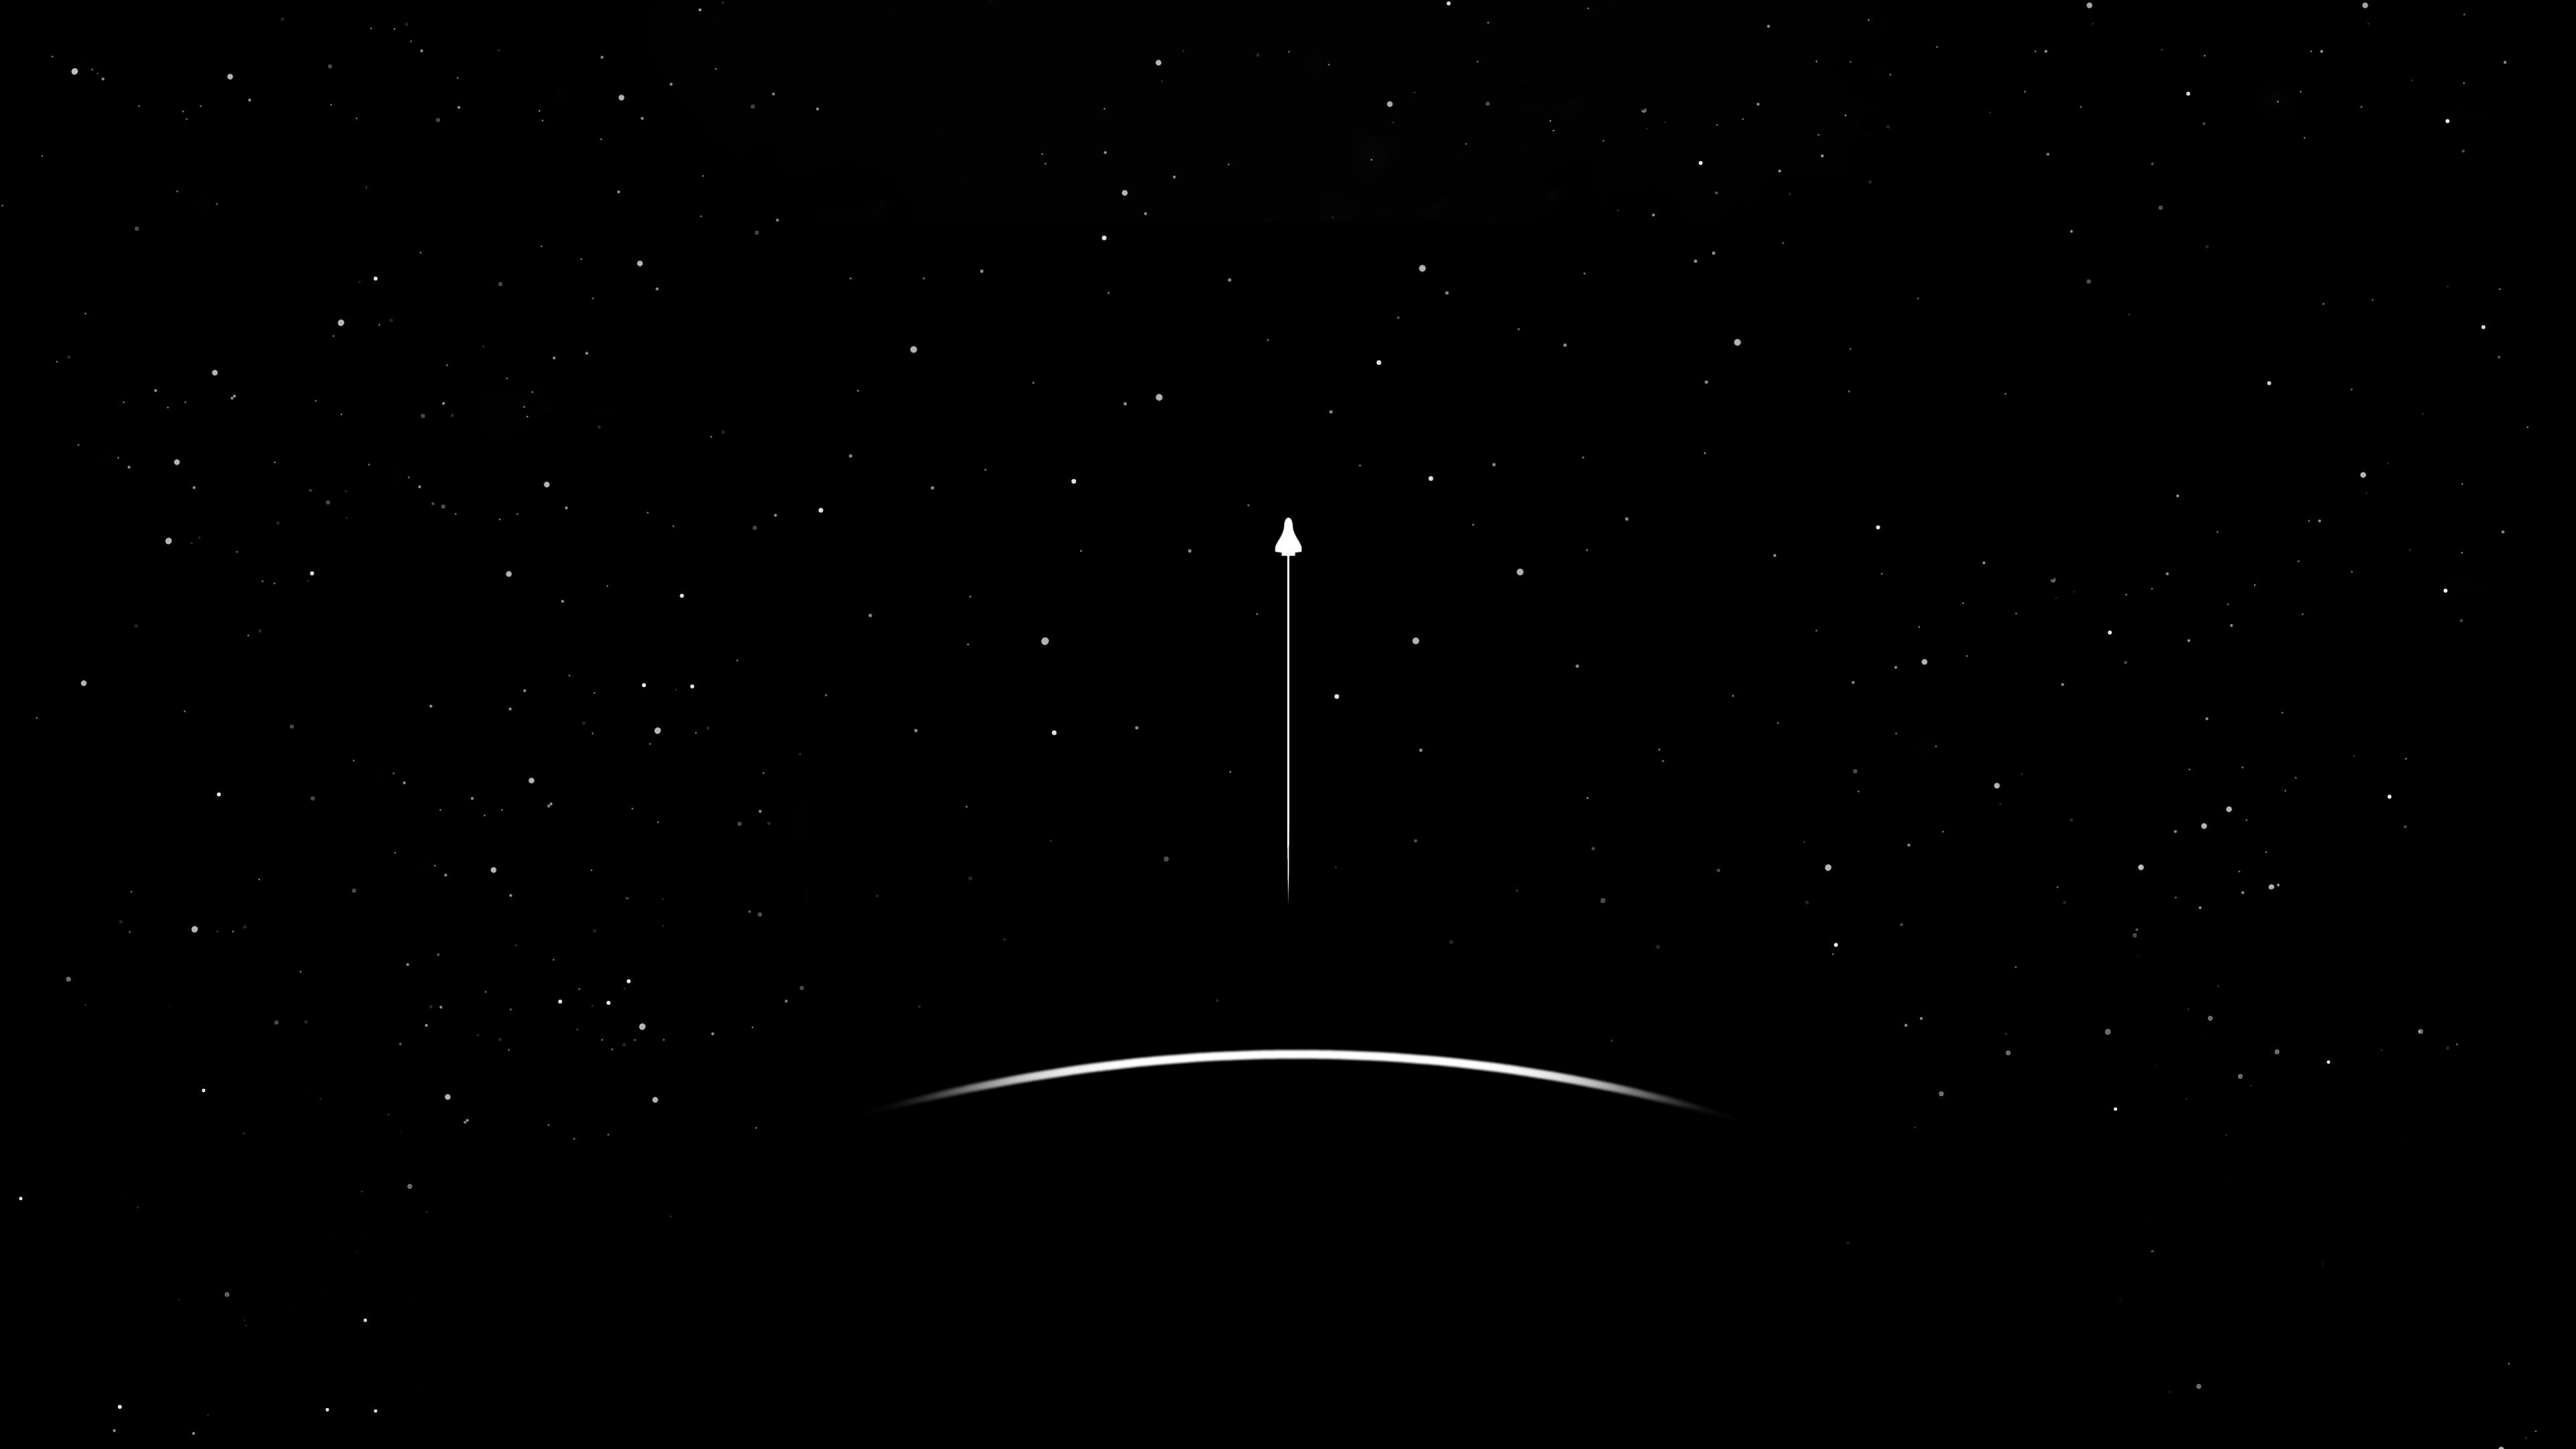 Nave Espacial 4k Ultra Papel De Parede Hd Plano De Fundo